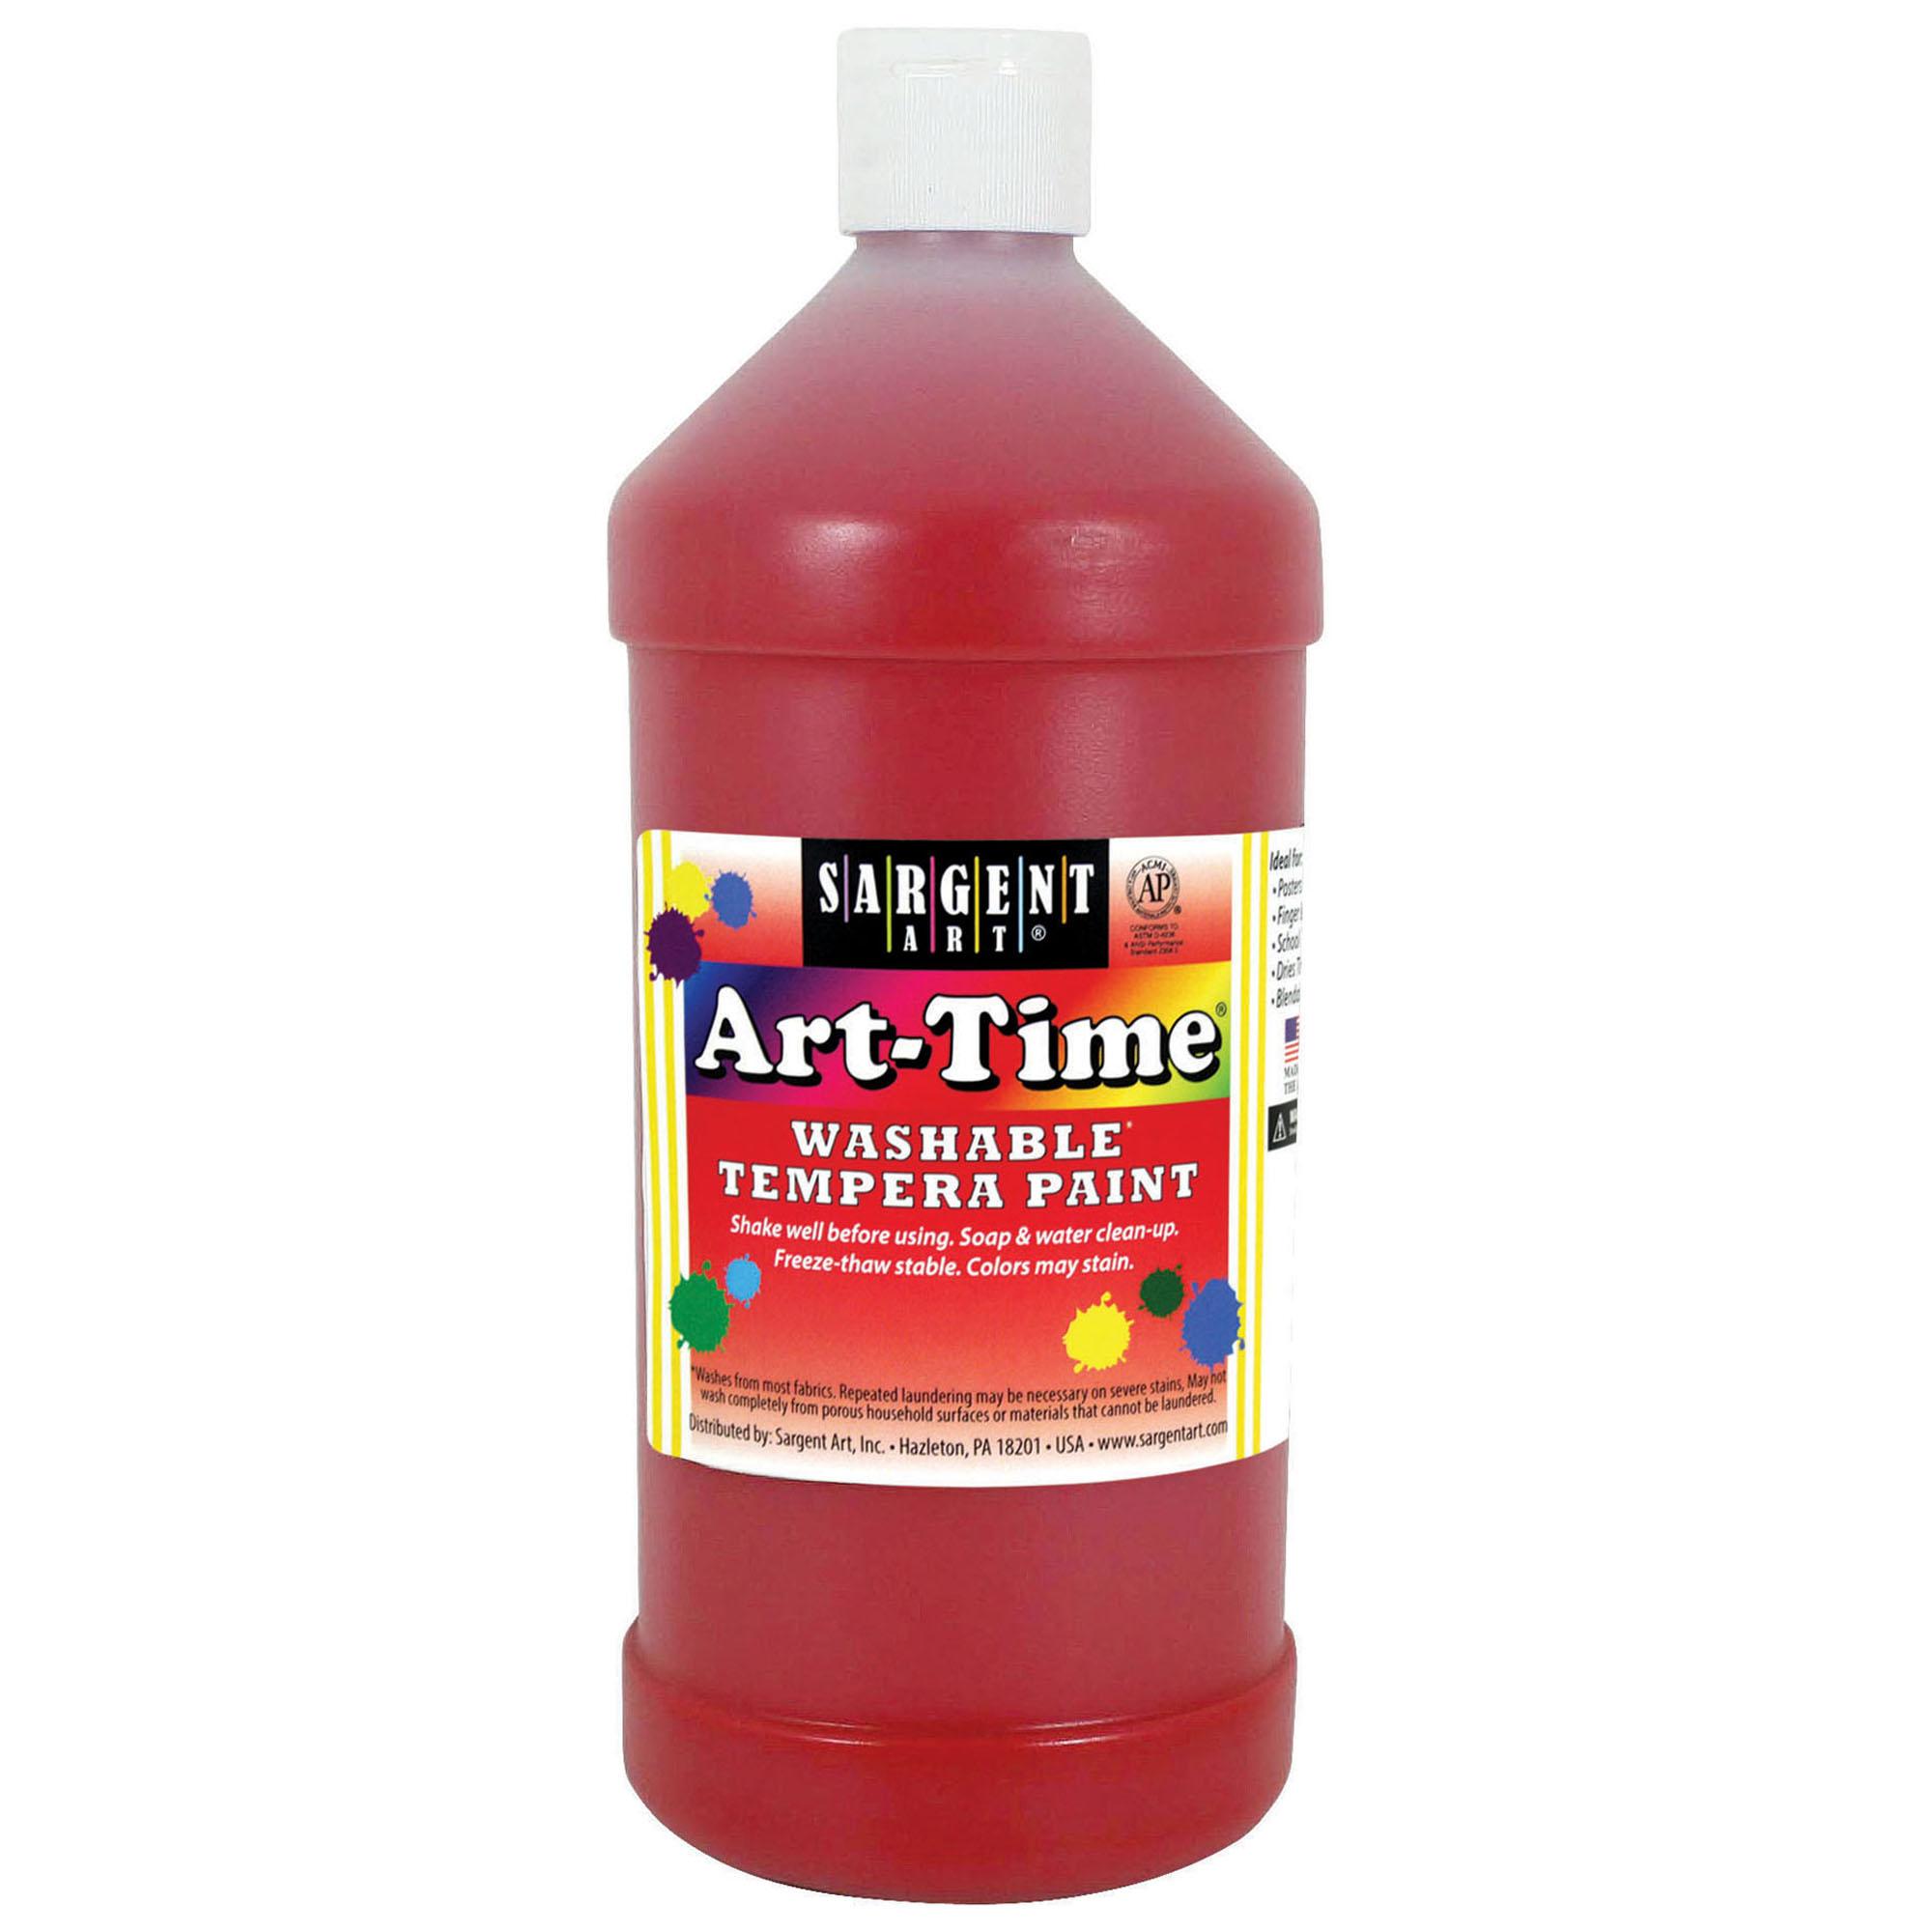 Art-Time® Washable Tempera Paint, Red - 32 oz., 6/pkg